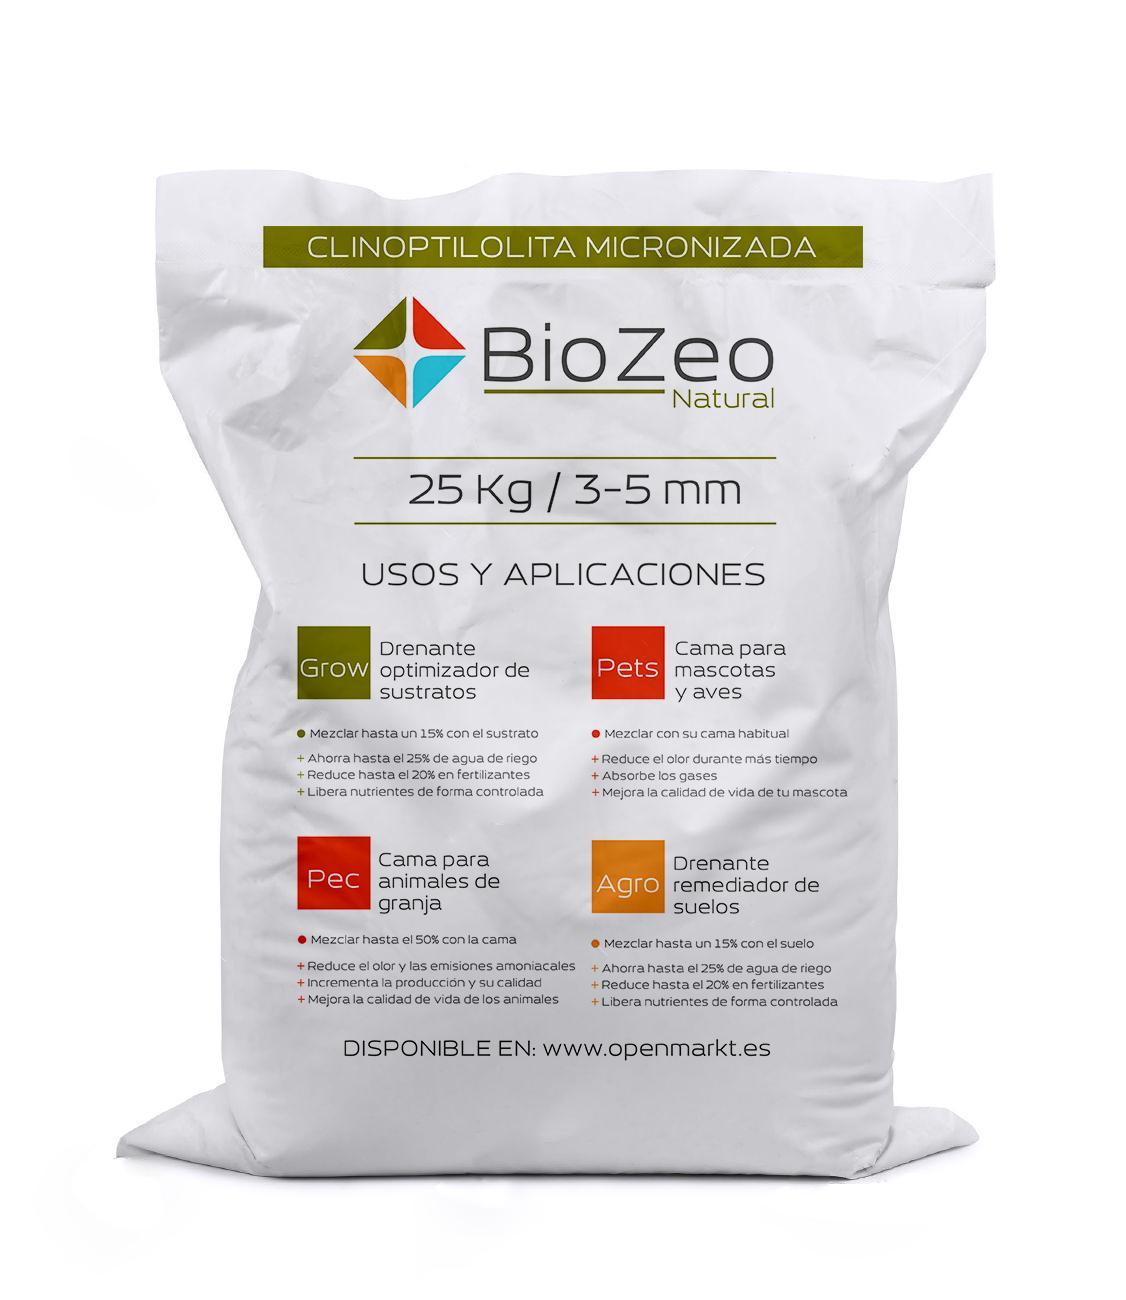 BioZeo NATURAL 3-5mm  Zeolita Clinoptilolita